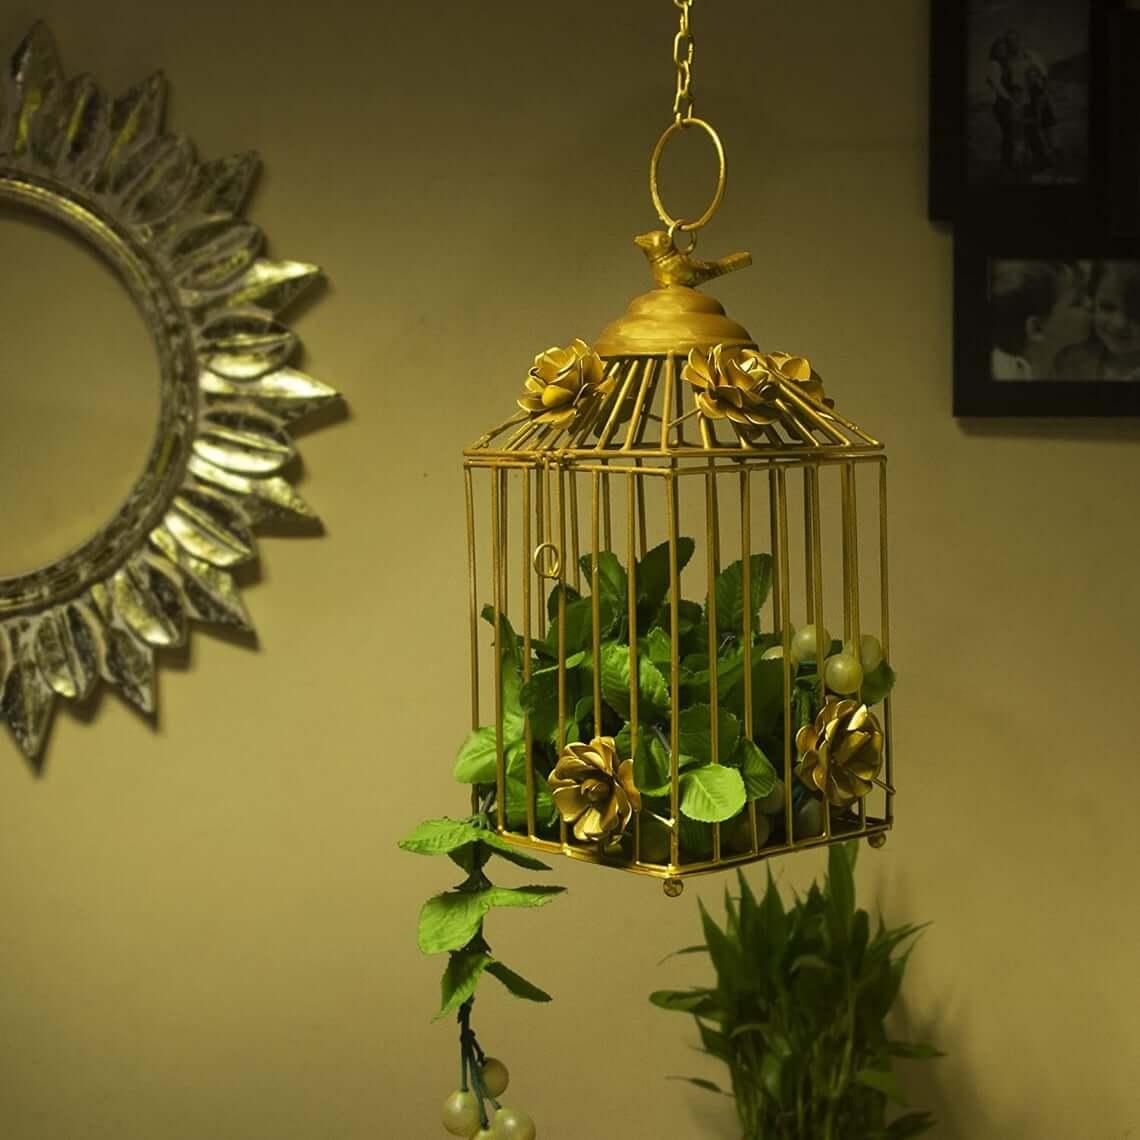 Indoor Golden Pendant Birdcage Plant Decoration